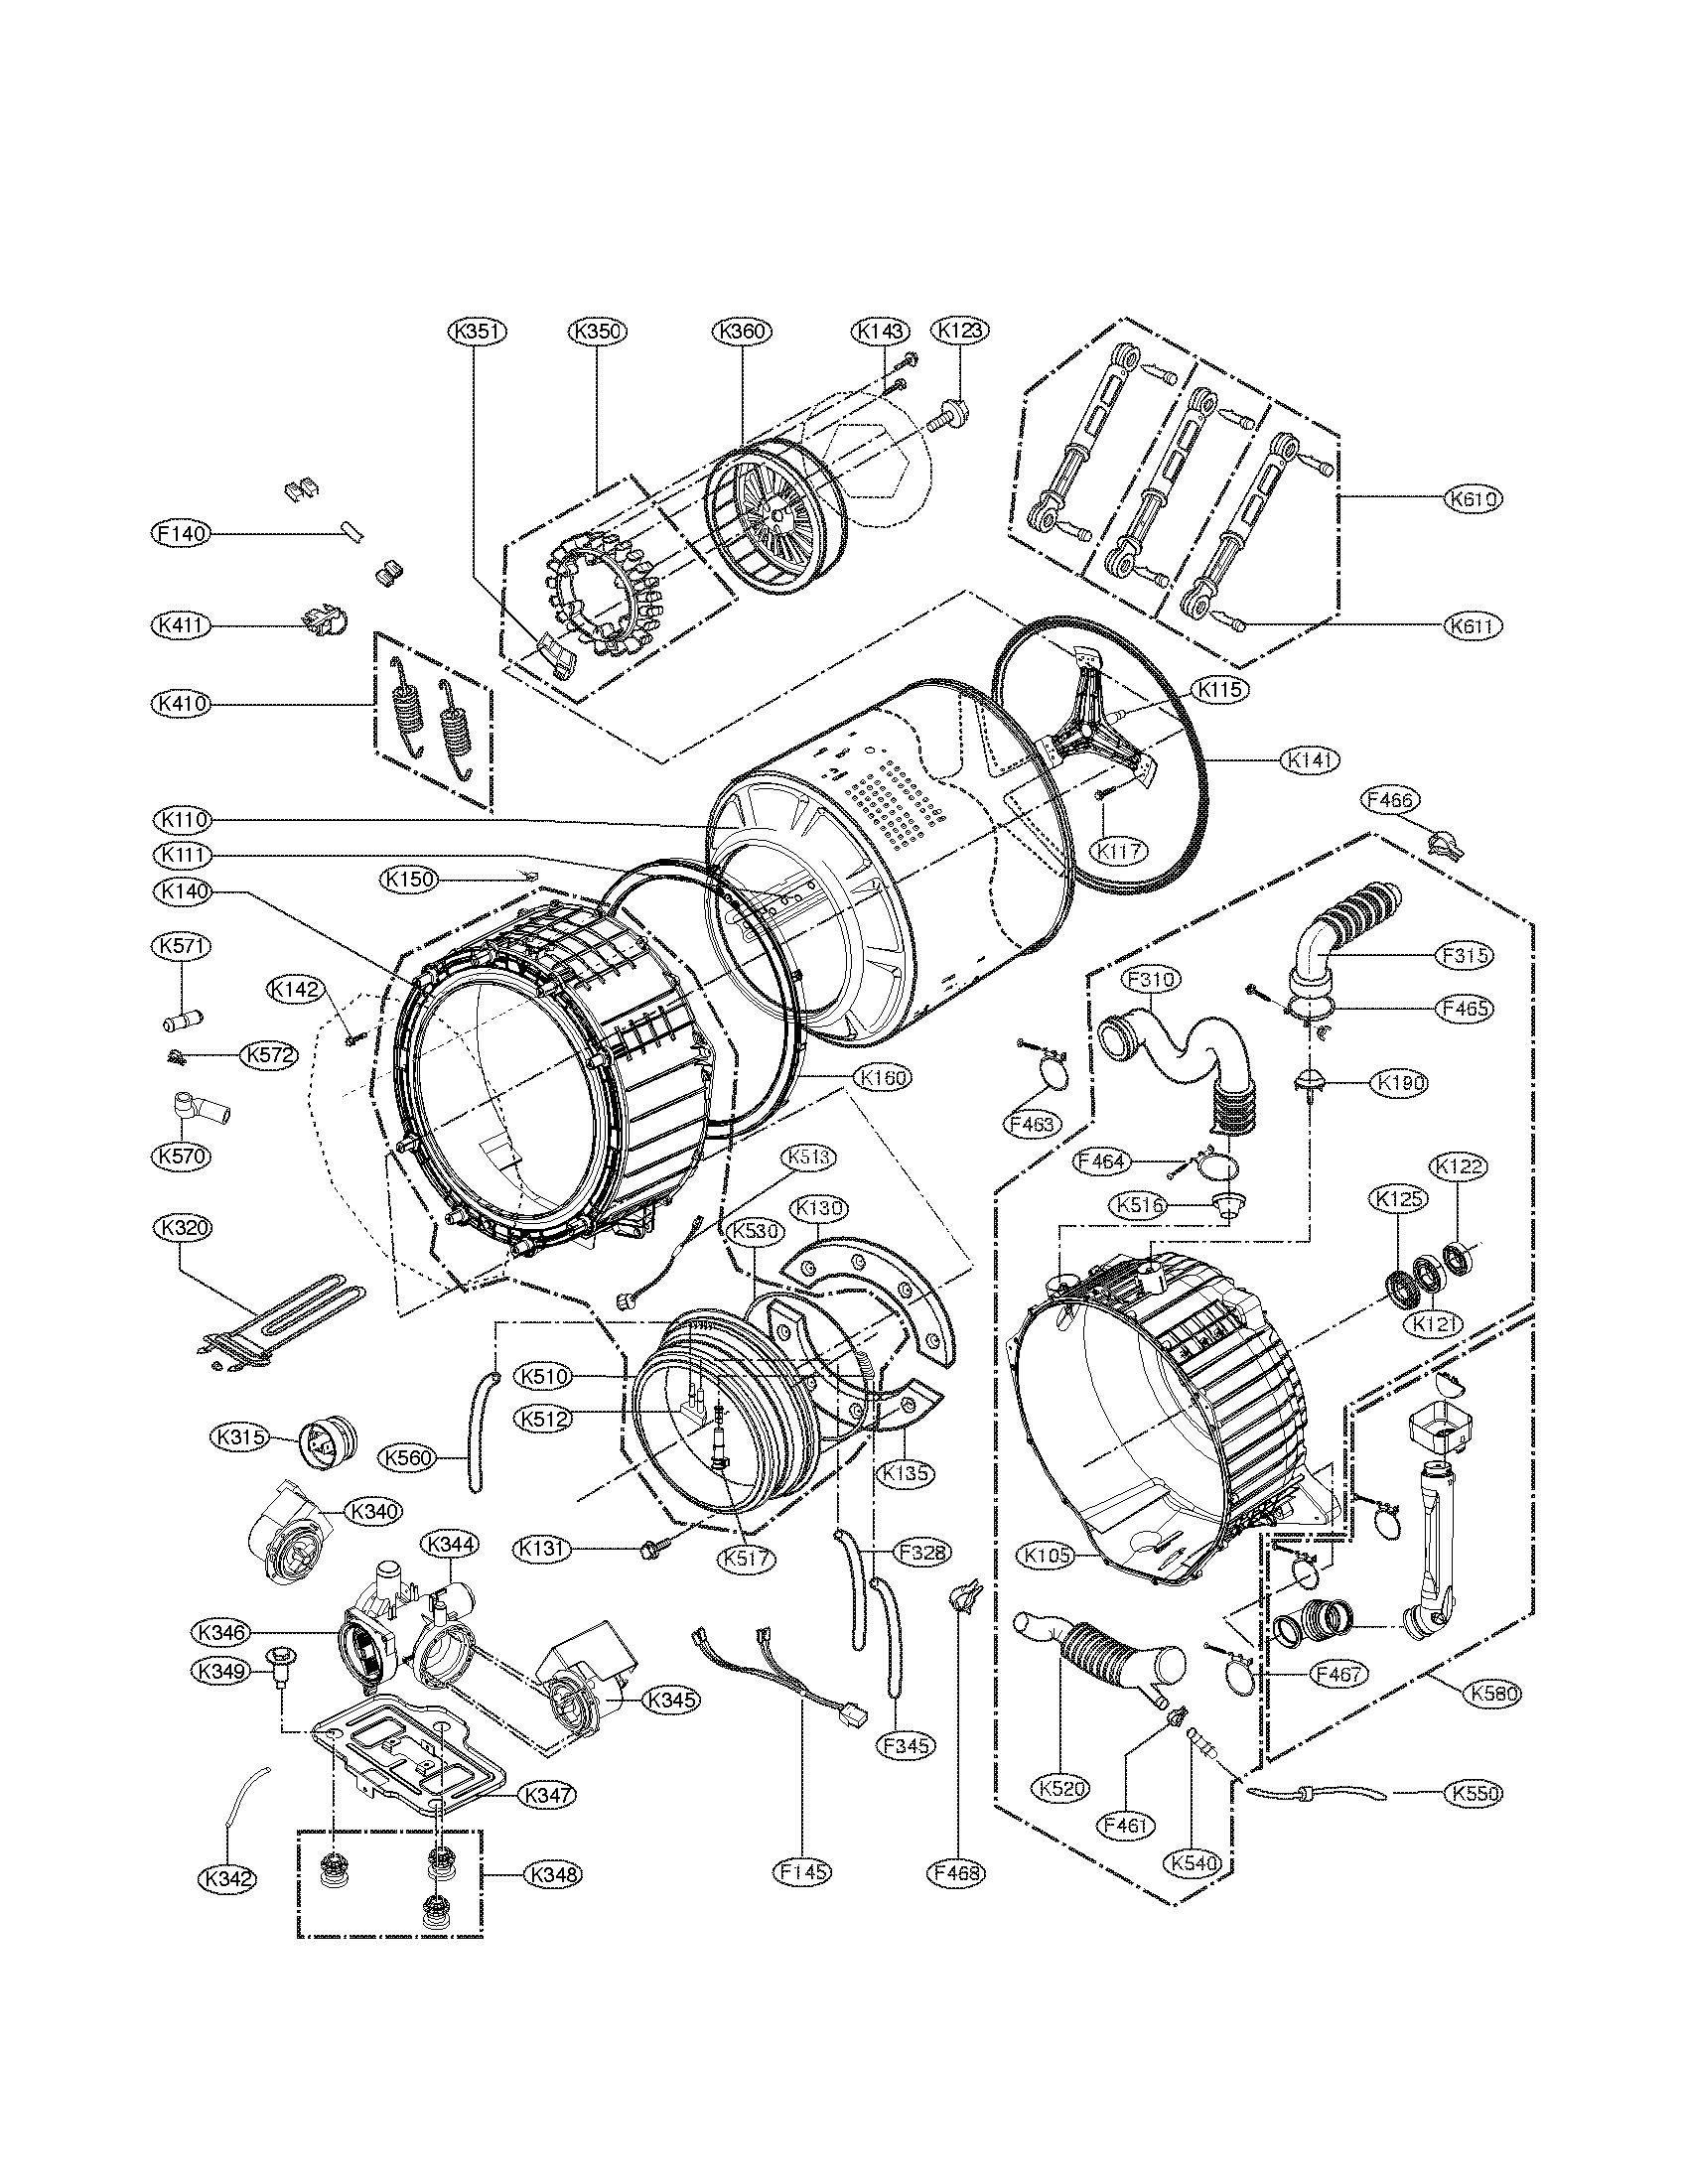 medium resolution of lg washer parts model wm3875hvca sears partsdirect lg washerlg washer parts model wm3875hvca sears partsdirect